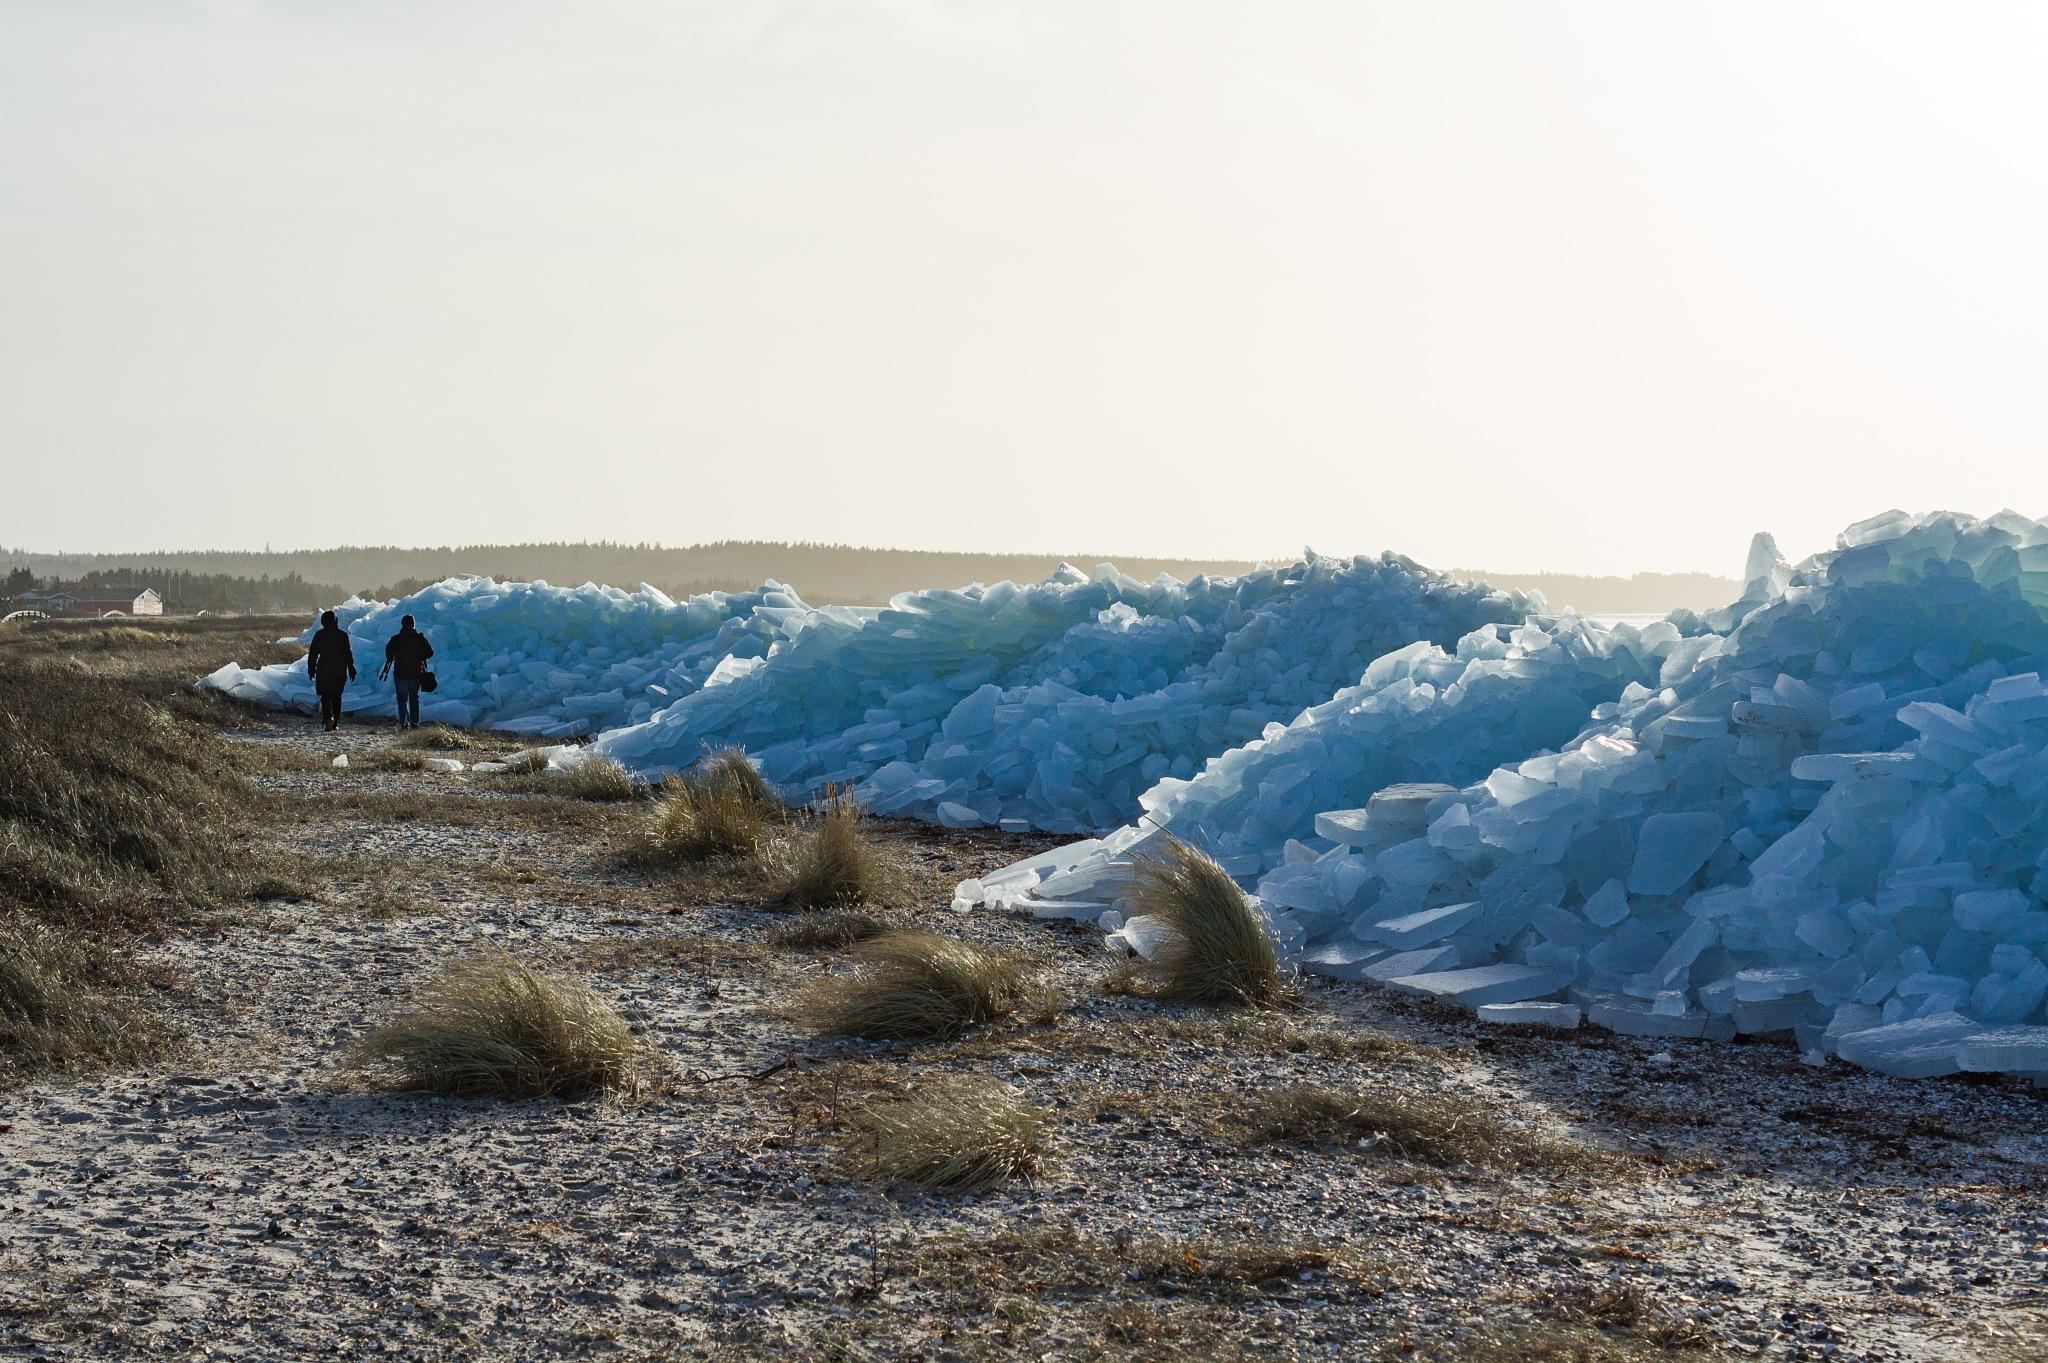 Ice shoves II by Per Borring